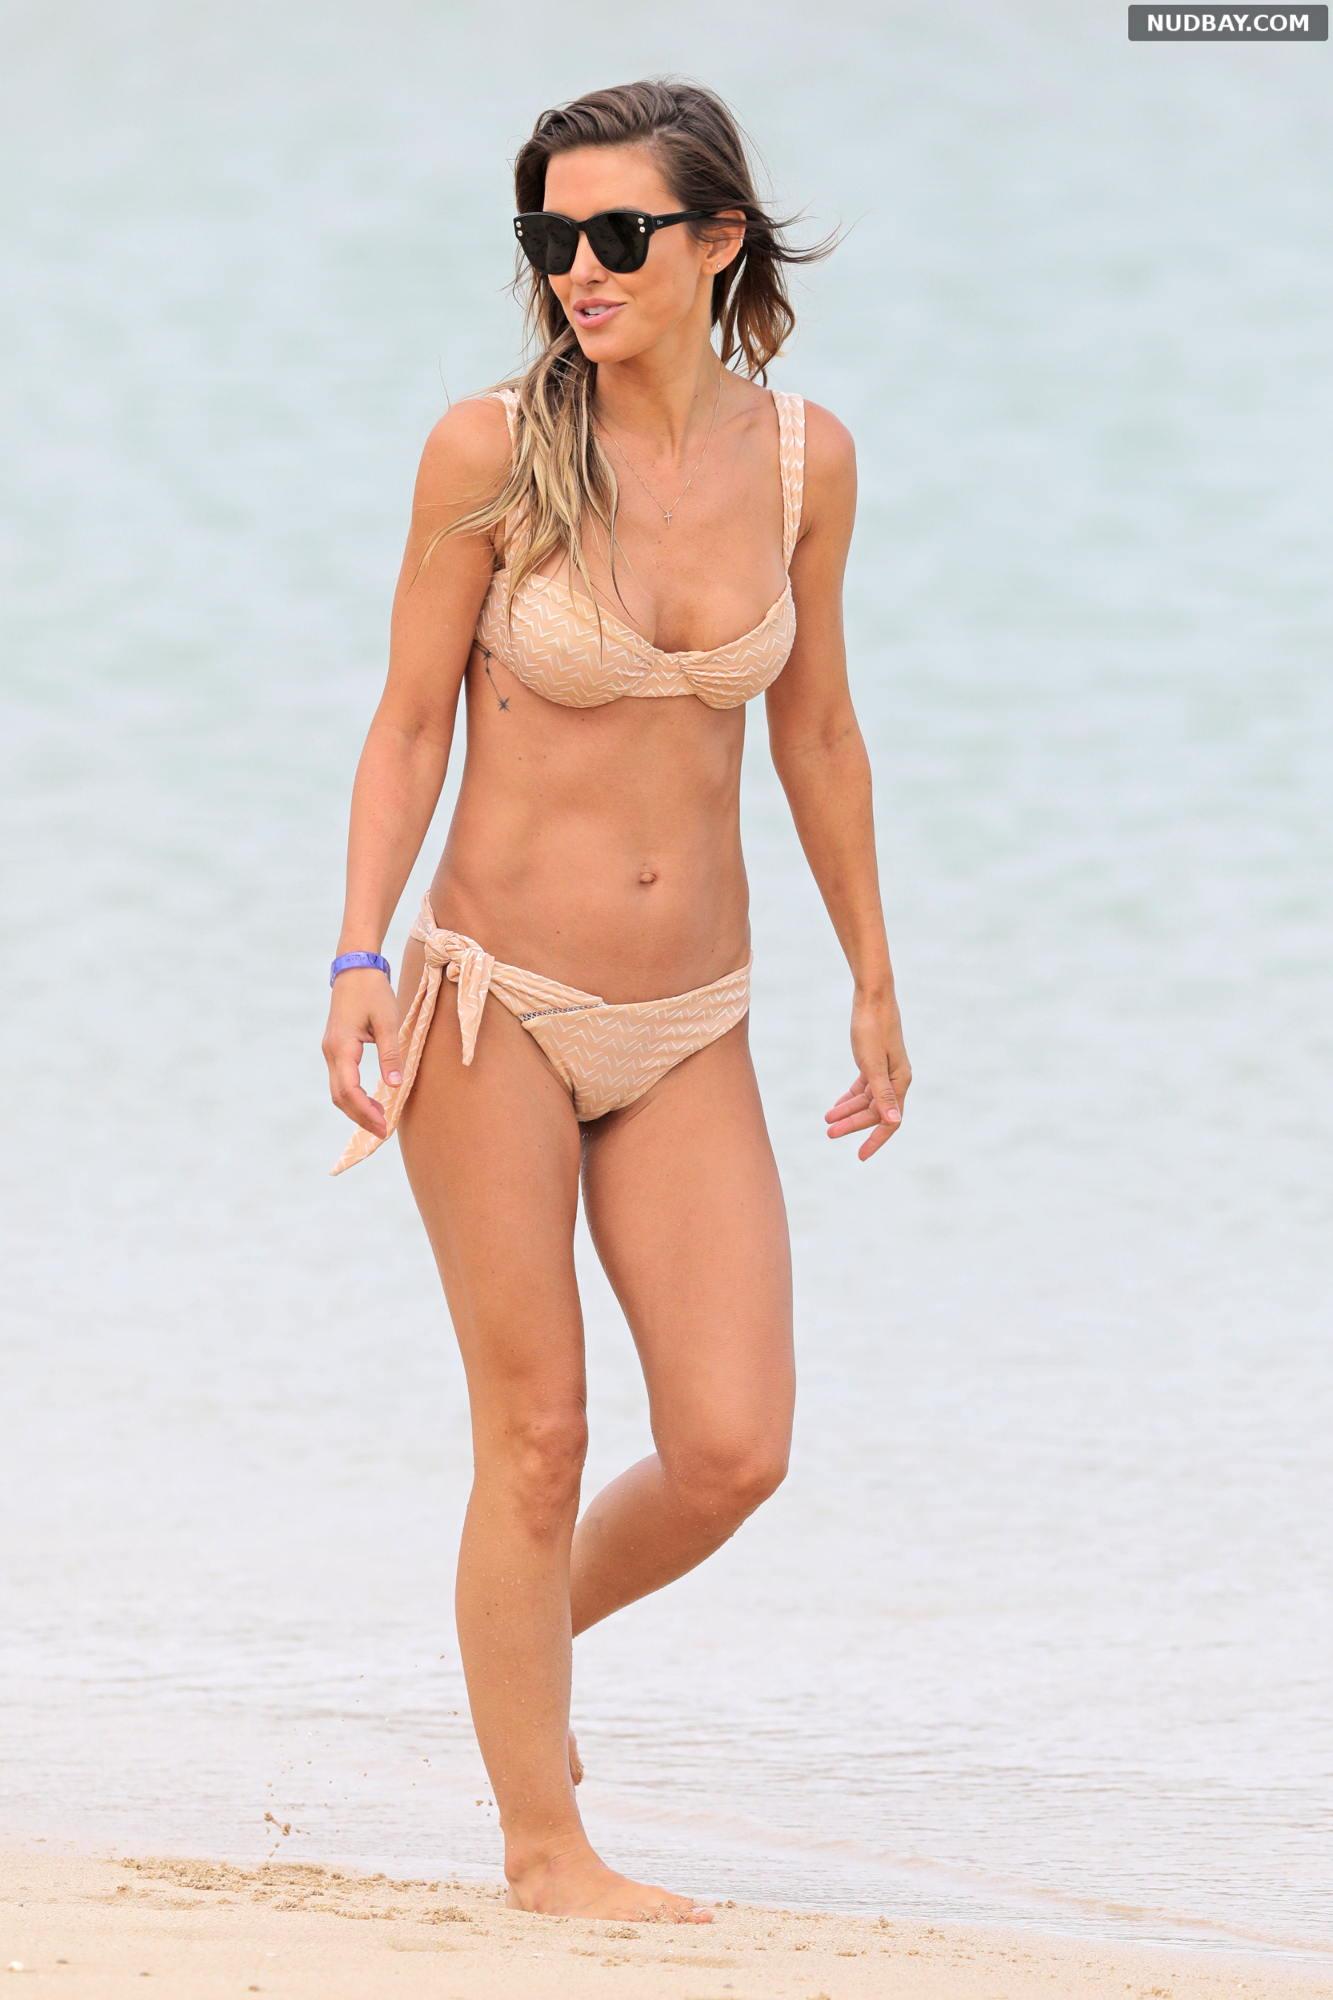 Audrina Patridge on the beach in Hawaii May 08 2021